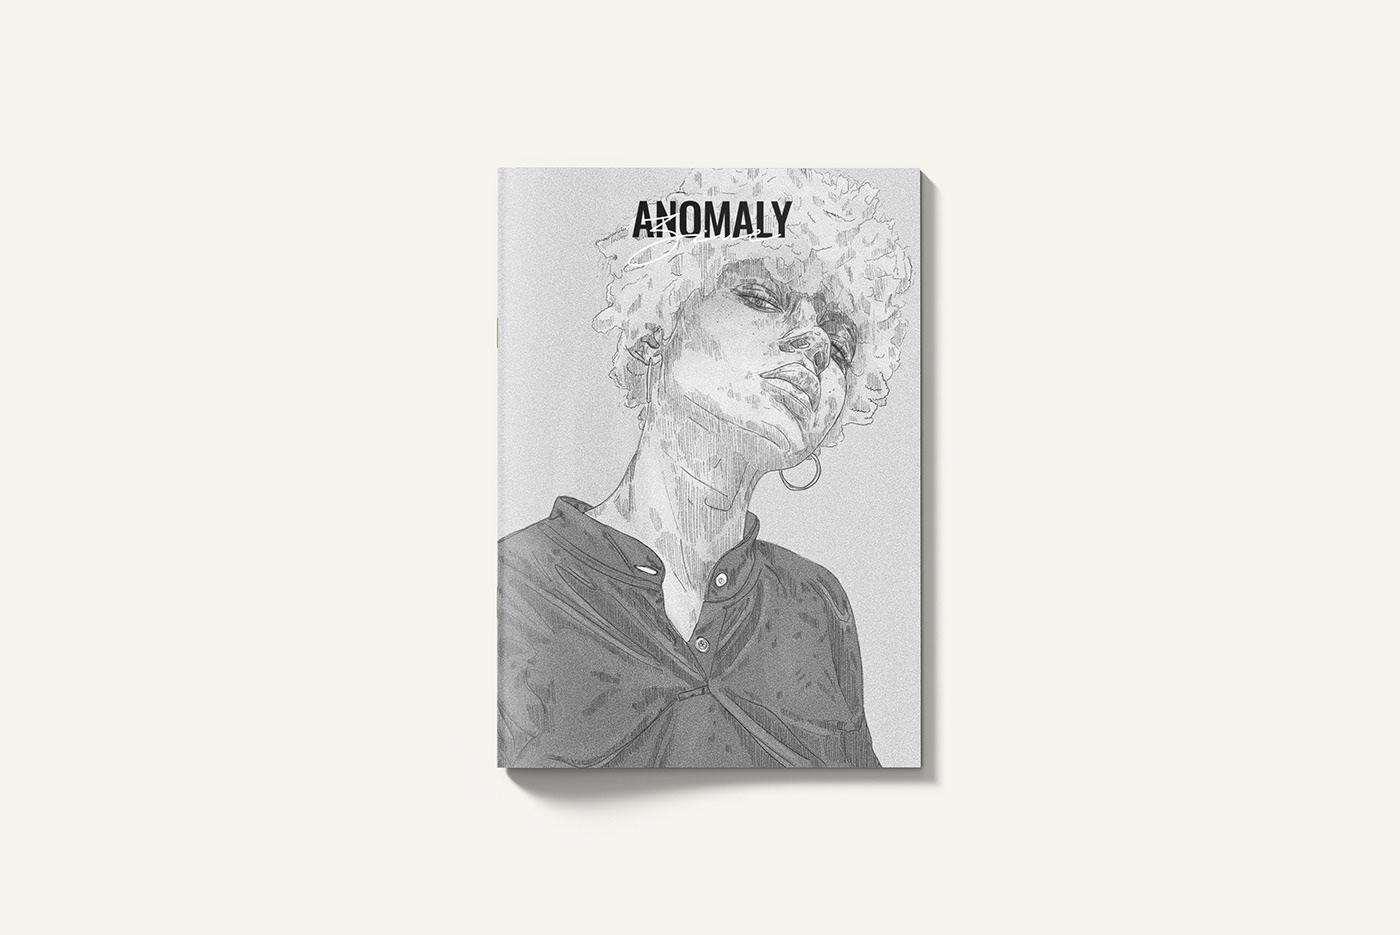 anomaly branding  desig editorial iinka ILLUSTRATION  music Photography  portraits streetstyle